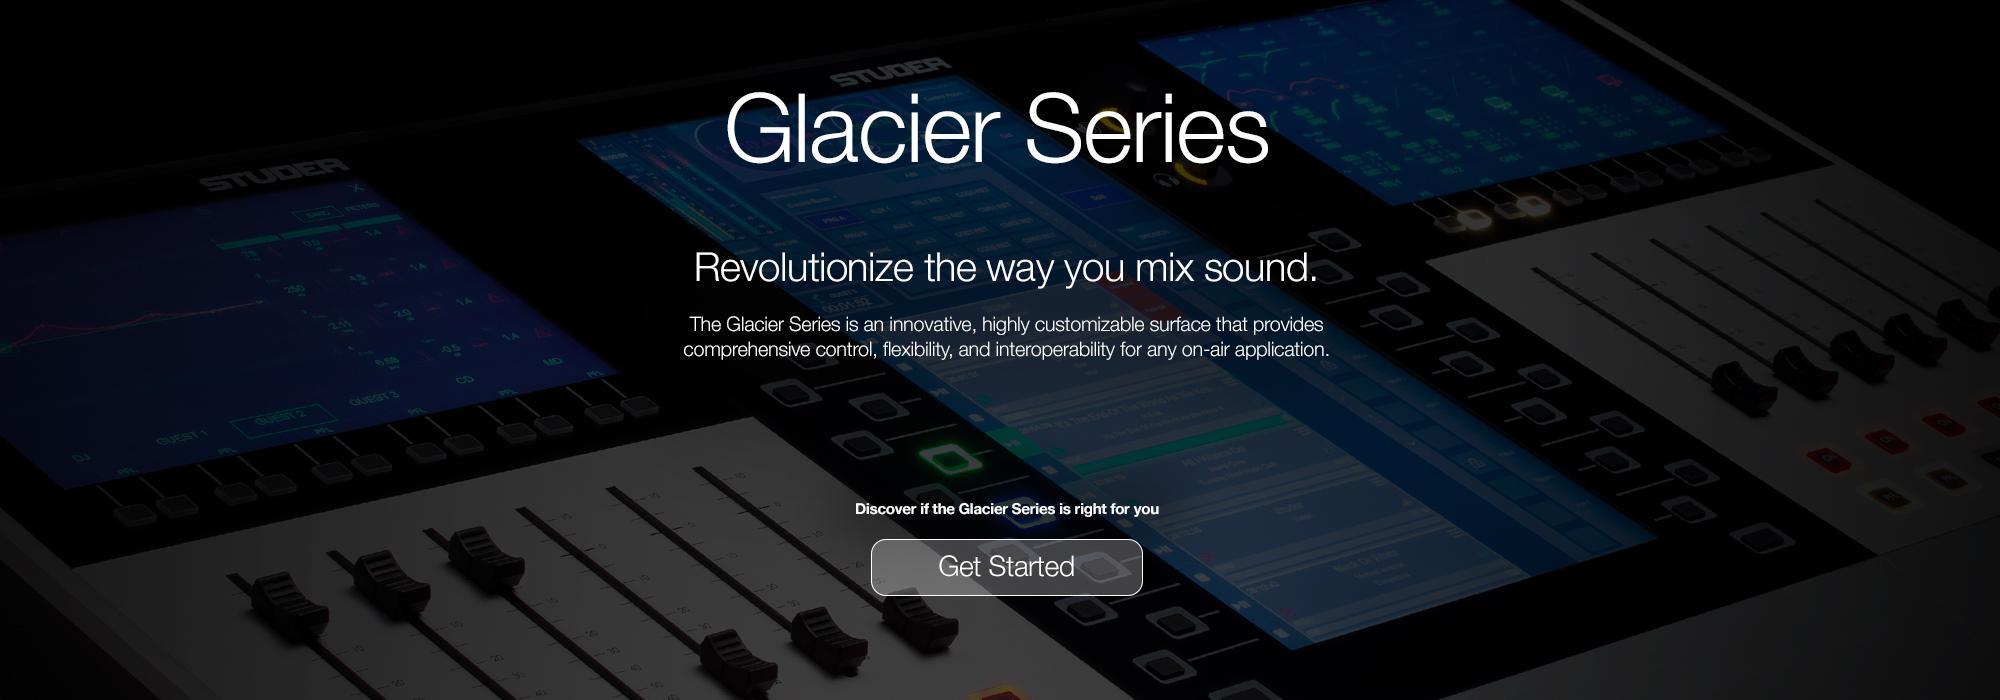 Studer glacier productpageimage original